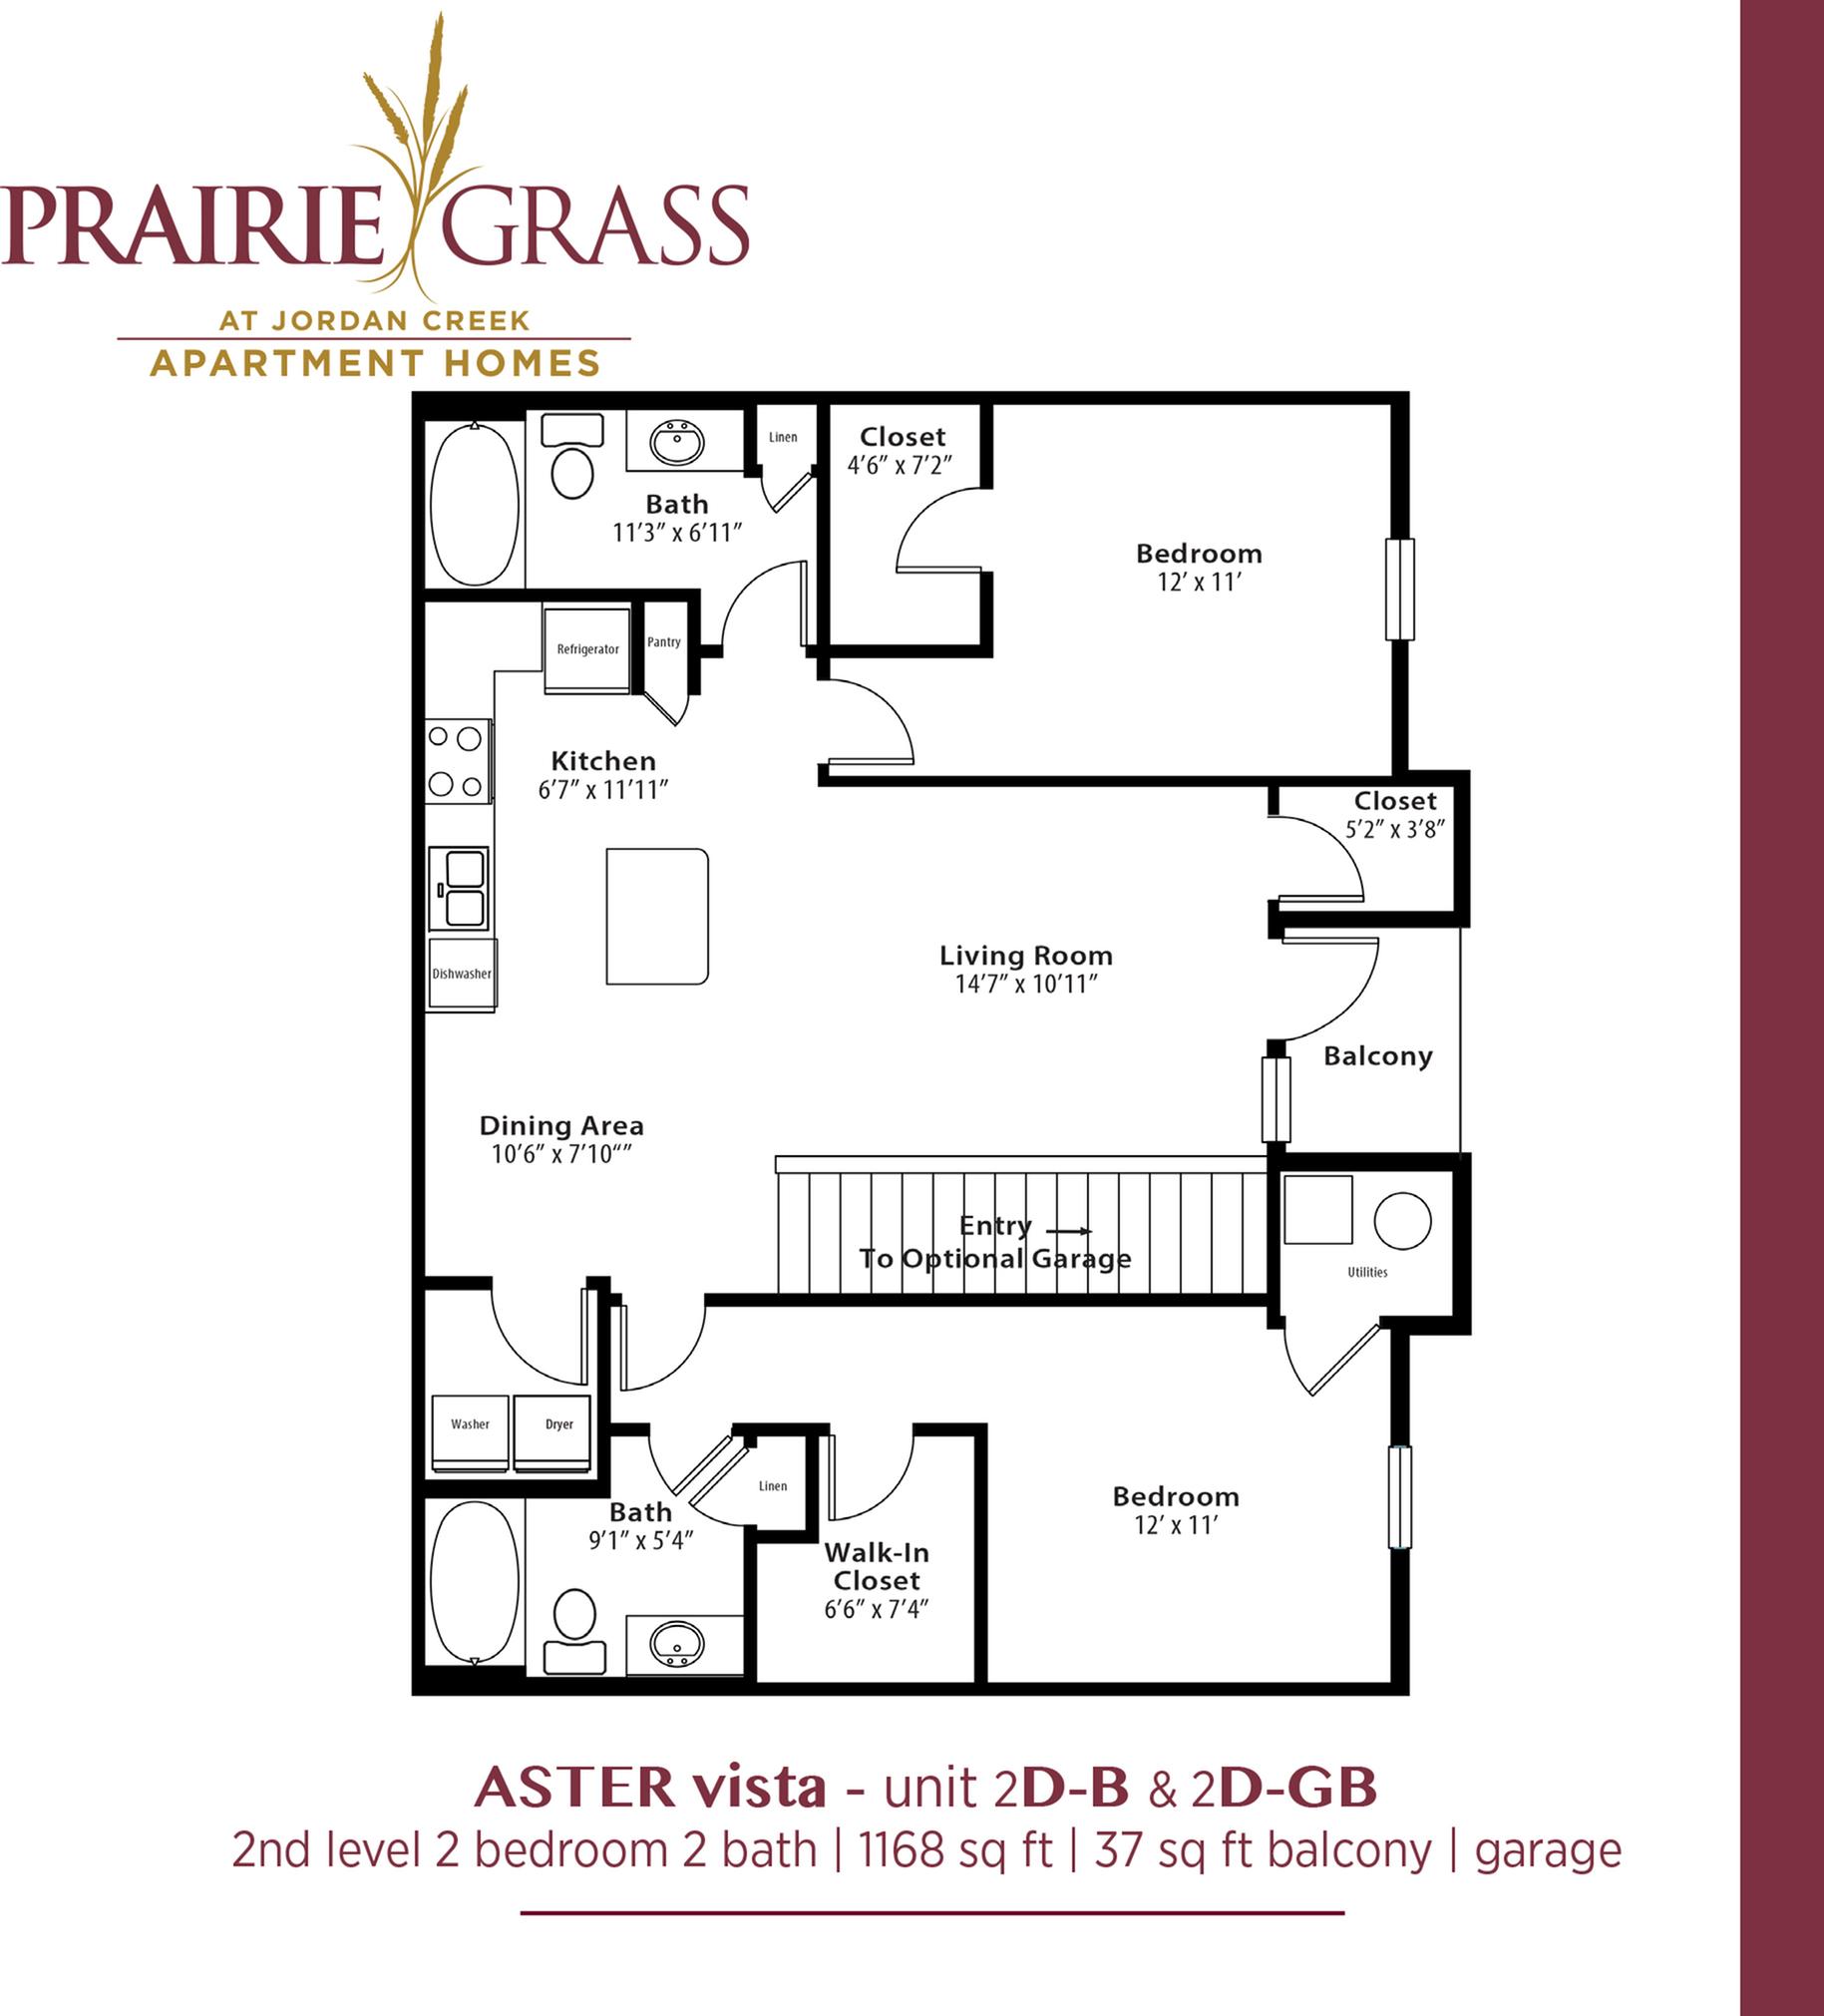 Aster Vista - Upper 2 Bedroom with Balcony